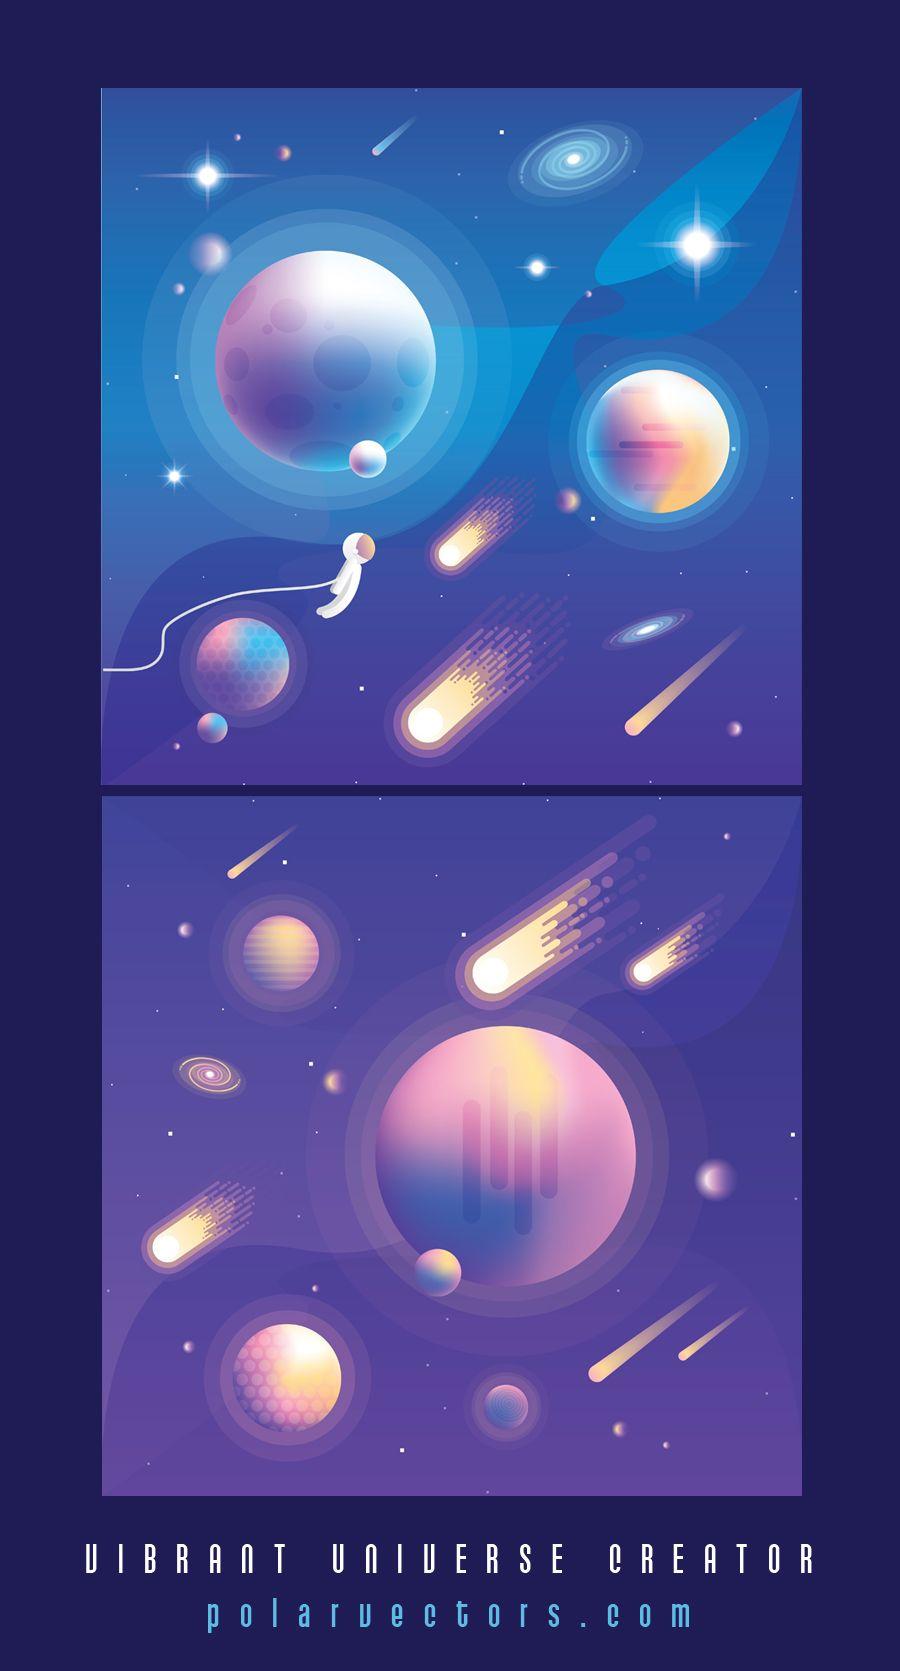 Vibrant Universe Creator Create Your Own Space Adventure Polar Vectors Planet Design Space Art Space Illustration